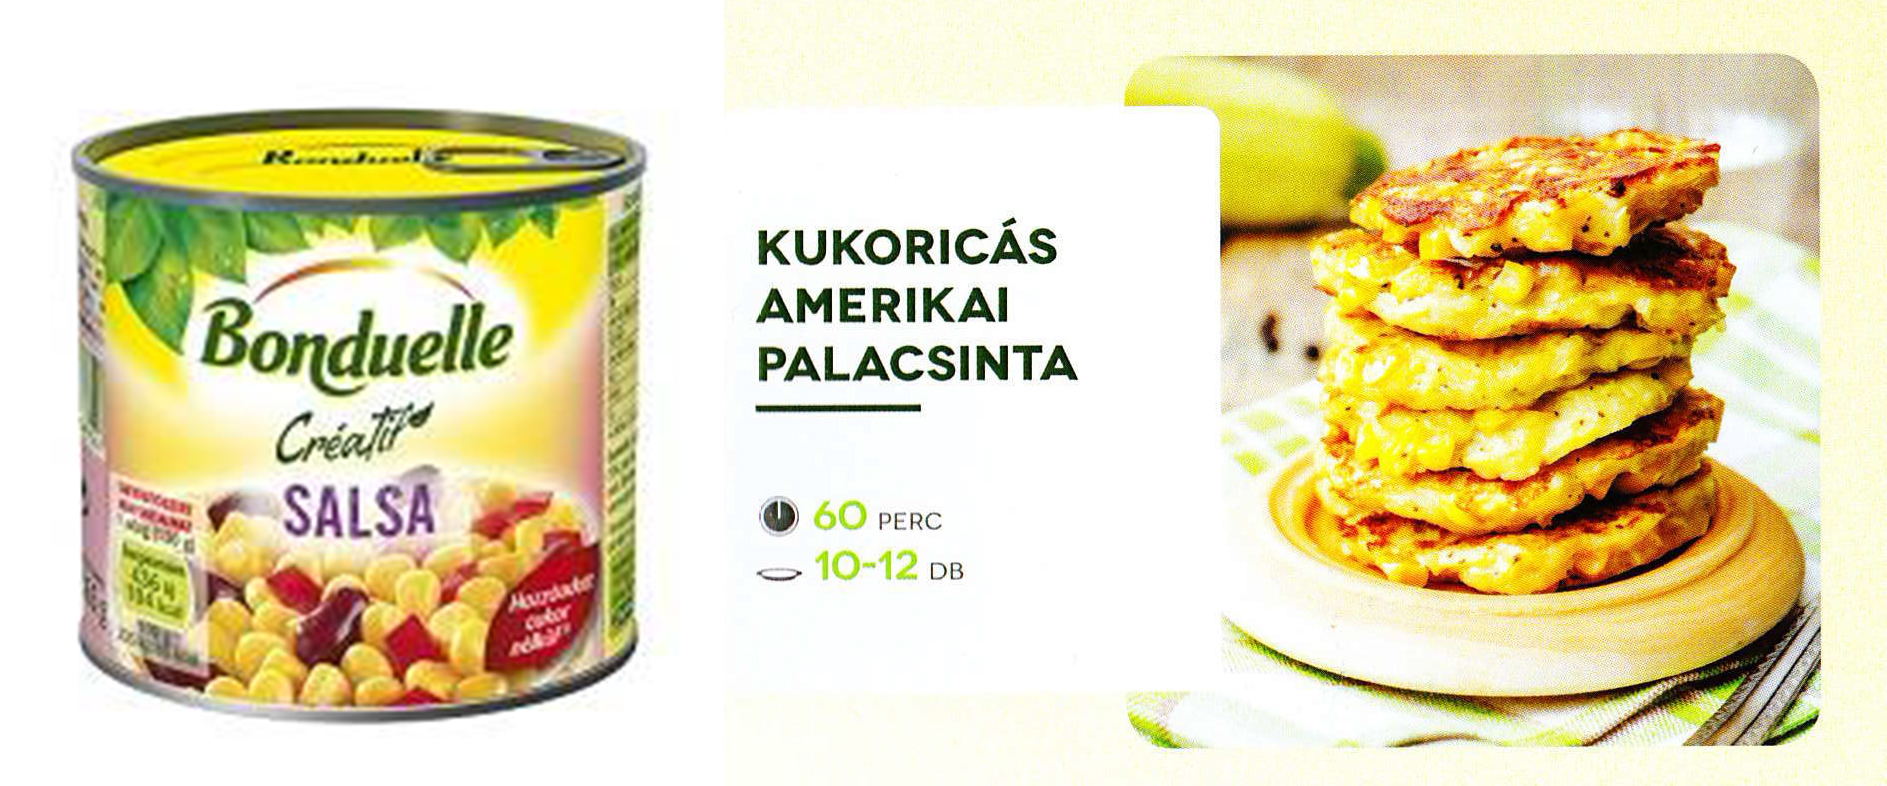 kukoricas_mix.jpg